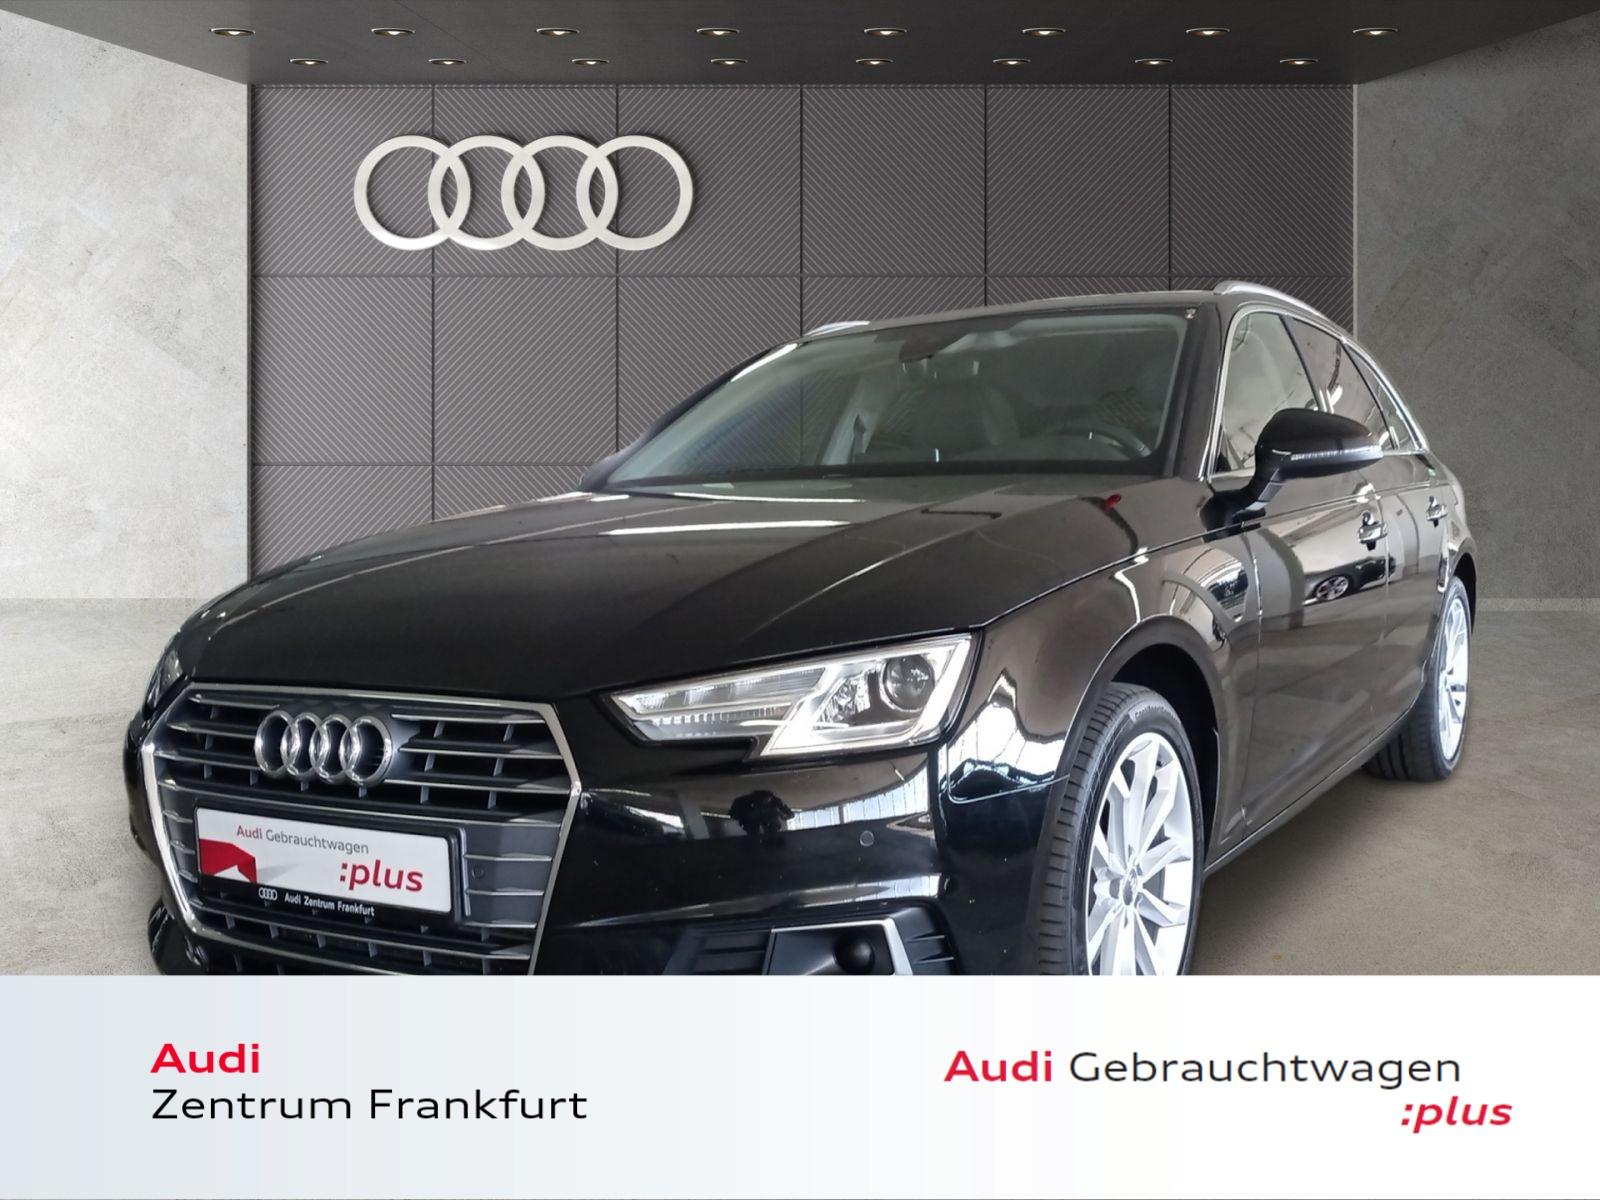 Audi A4 Avant 2.0 TFSI ultra sport S tronic Navi Xenon Tempomat, Jahr 2018, Benzin